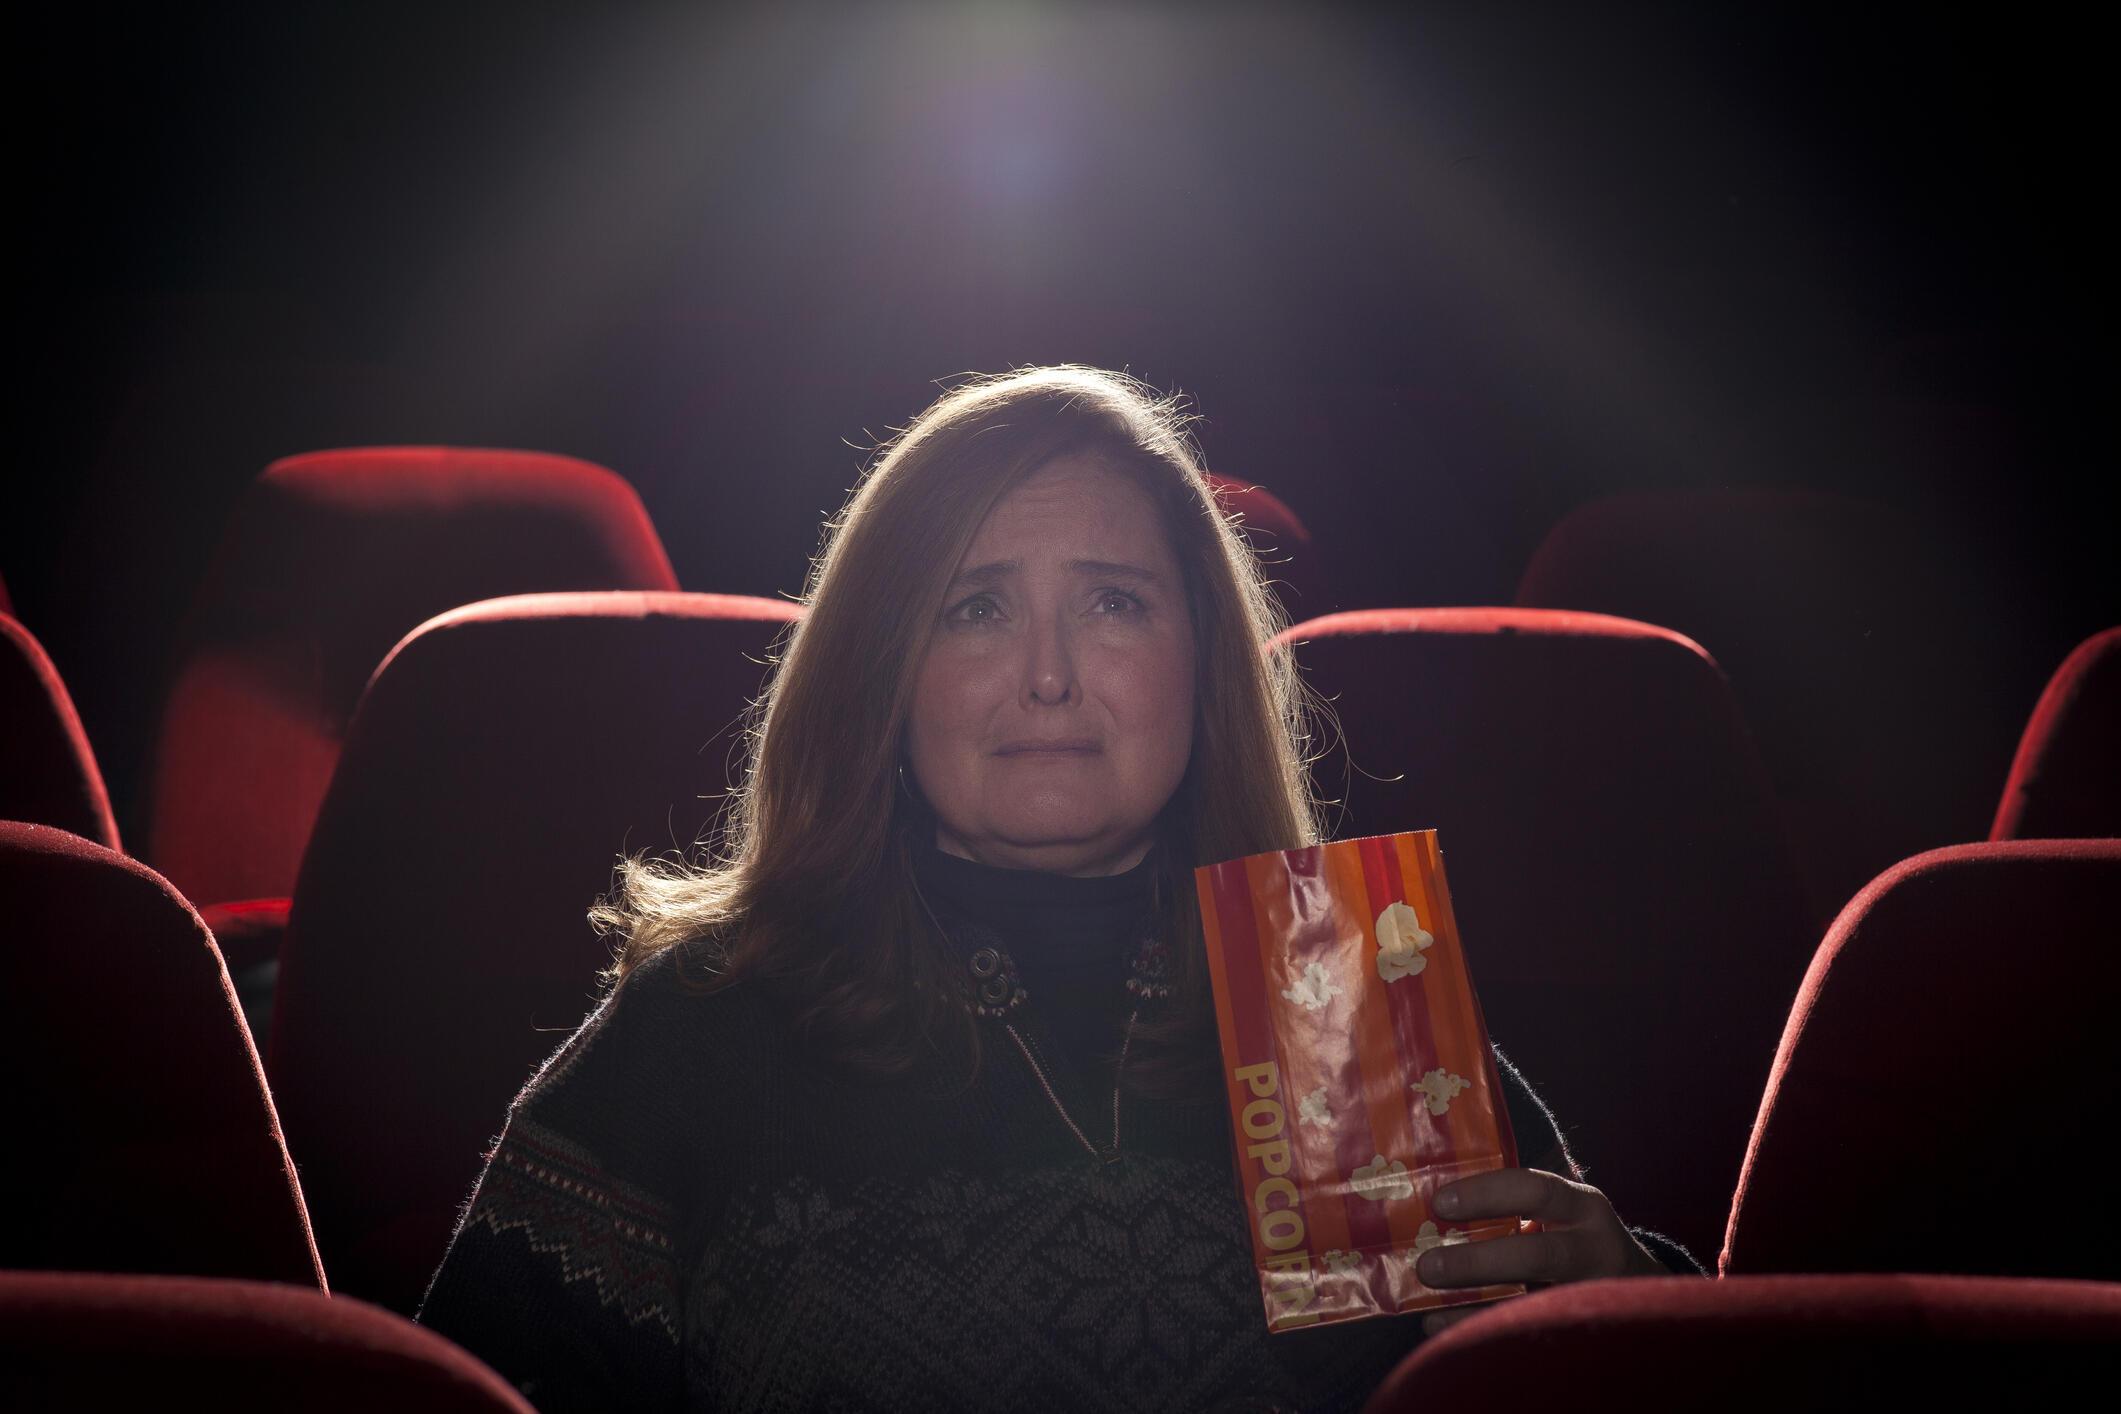 LOVE OUR LIST - Saddest Movie Scenes | Chris Carr & Company | K102